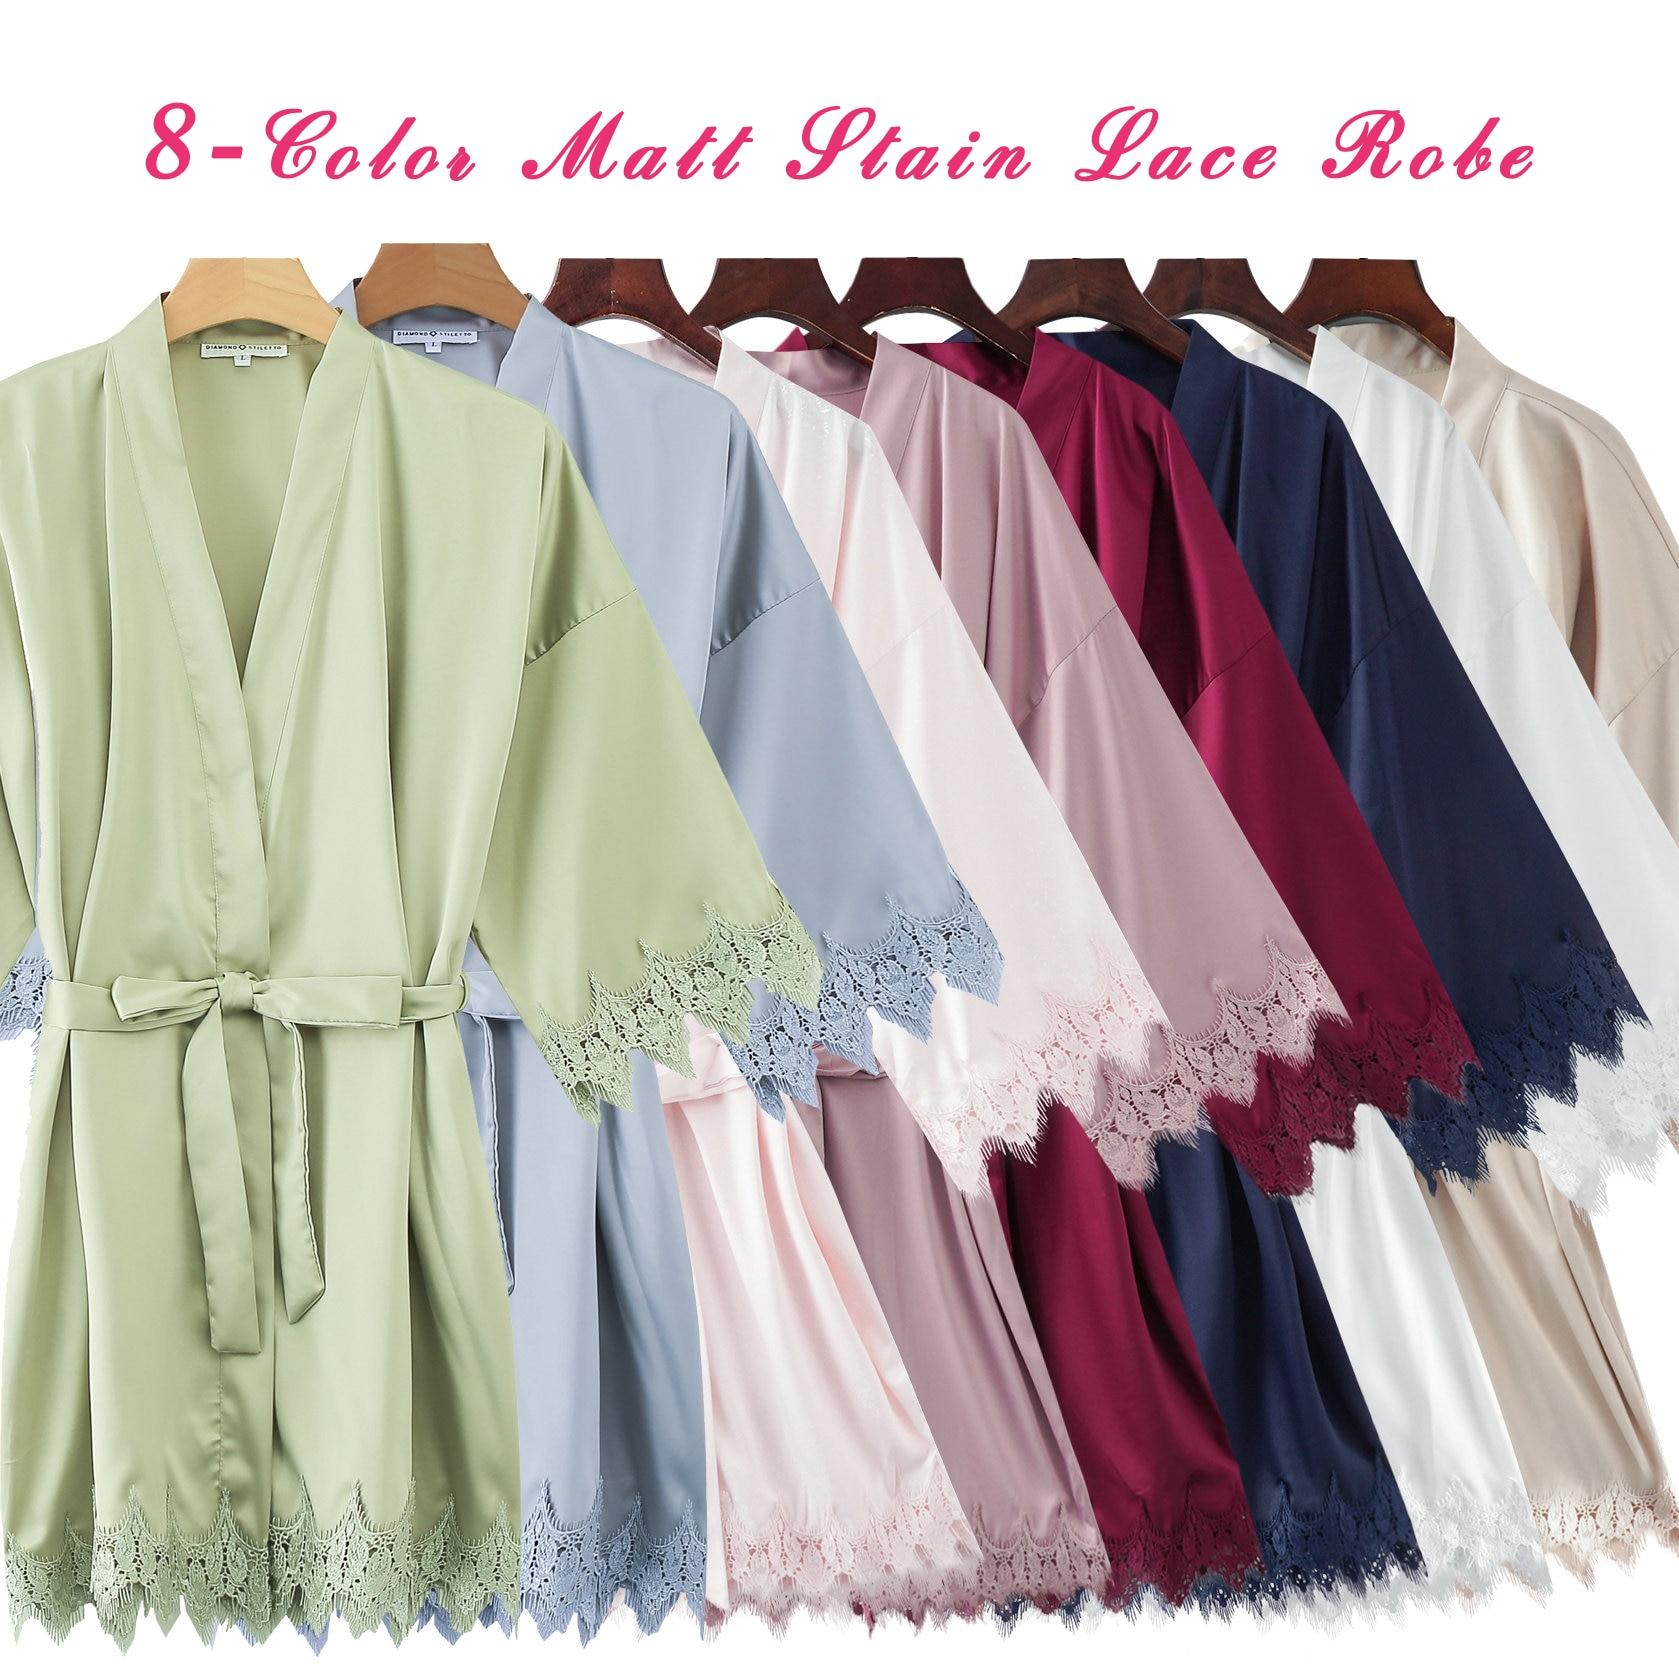 Image 4 - 2019 Matt Satin Lace Robe with Trim Gown Bridal Wedding Bride Robes Bridesmaid Kimono Robe Plus Size Women Bathrobe Dress Gown-in Robes from Underwear & Sleepwears